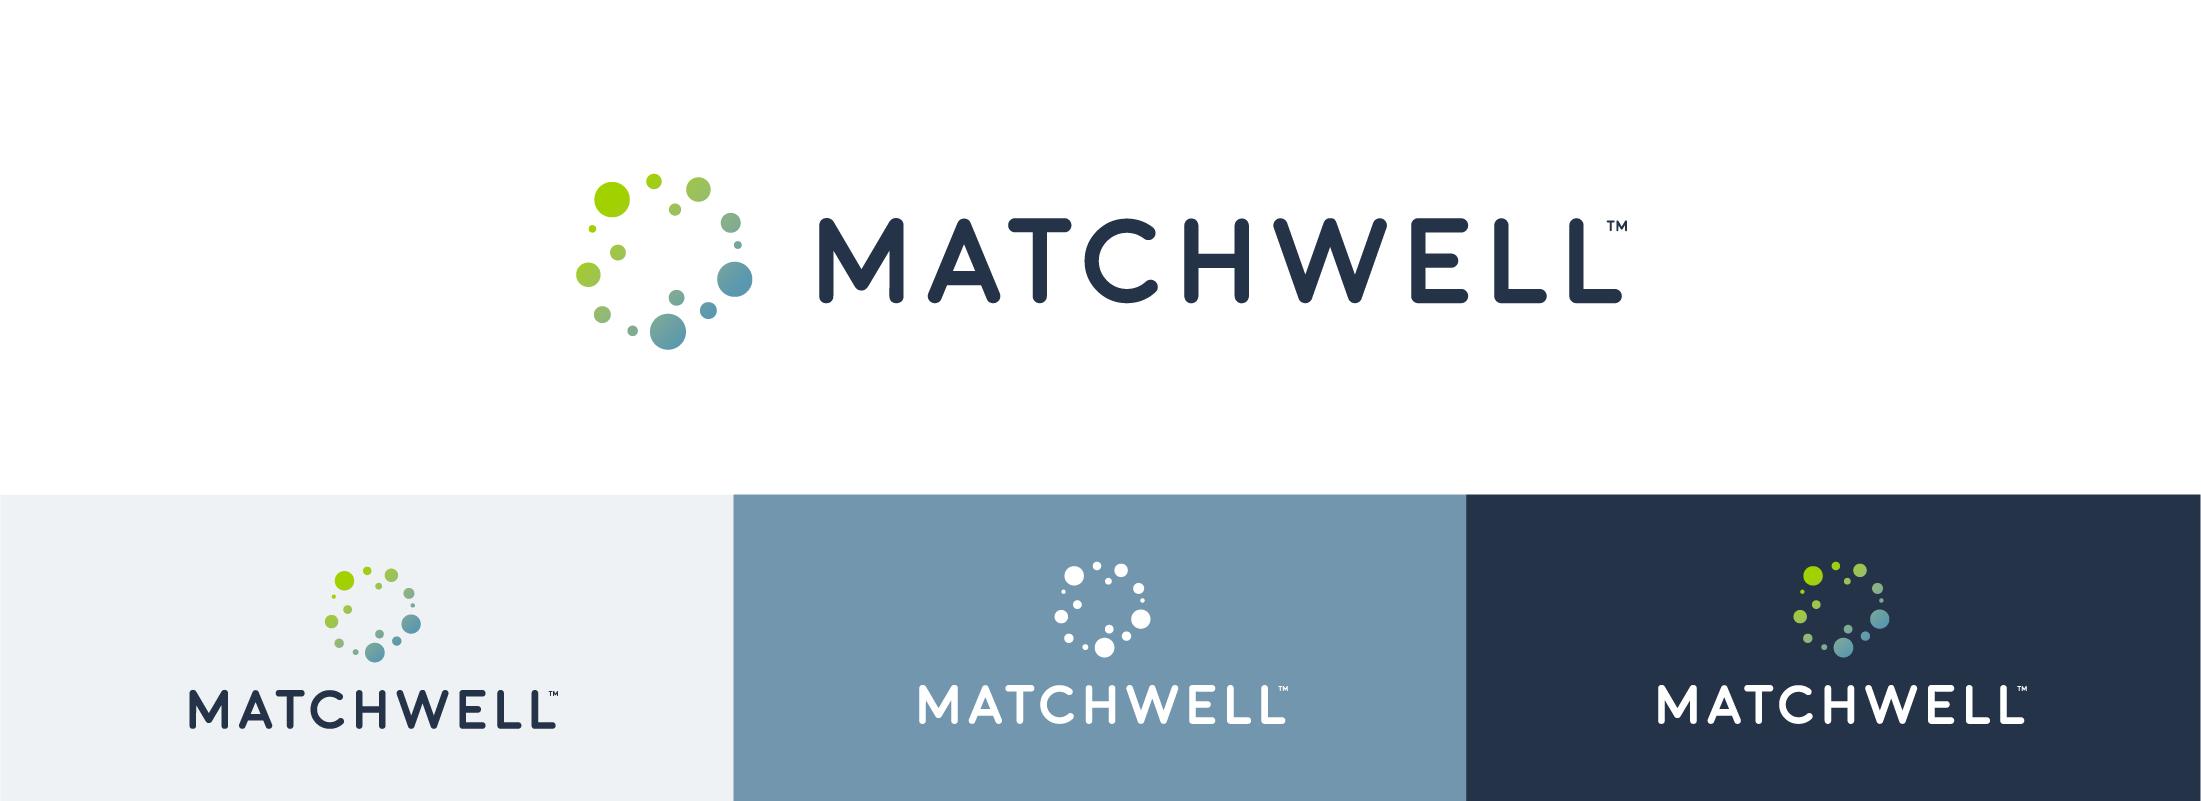 Matchwell logos